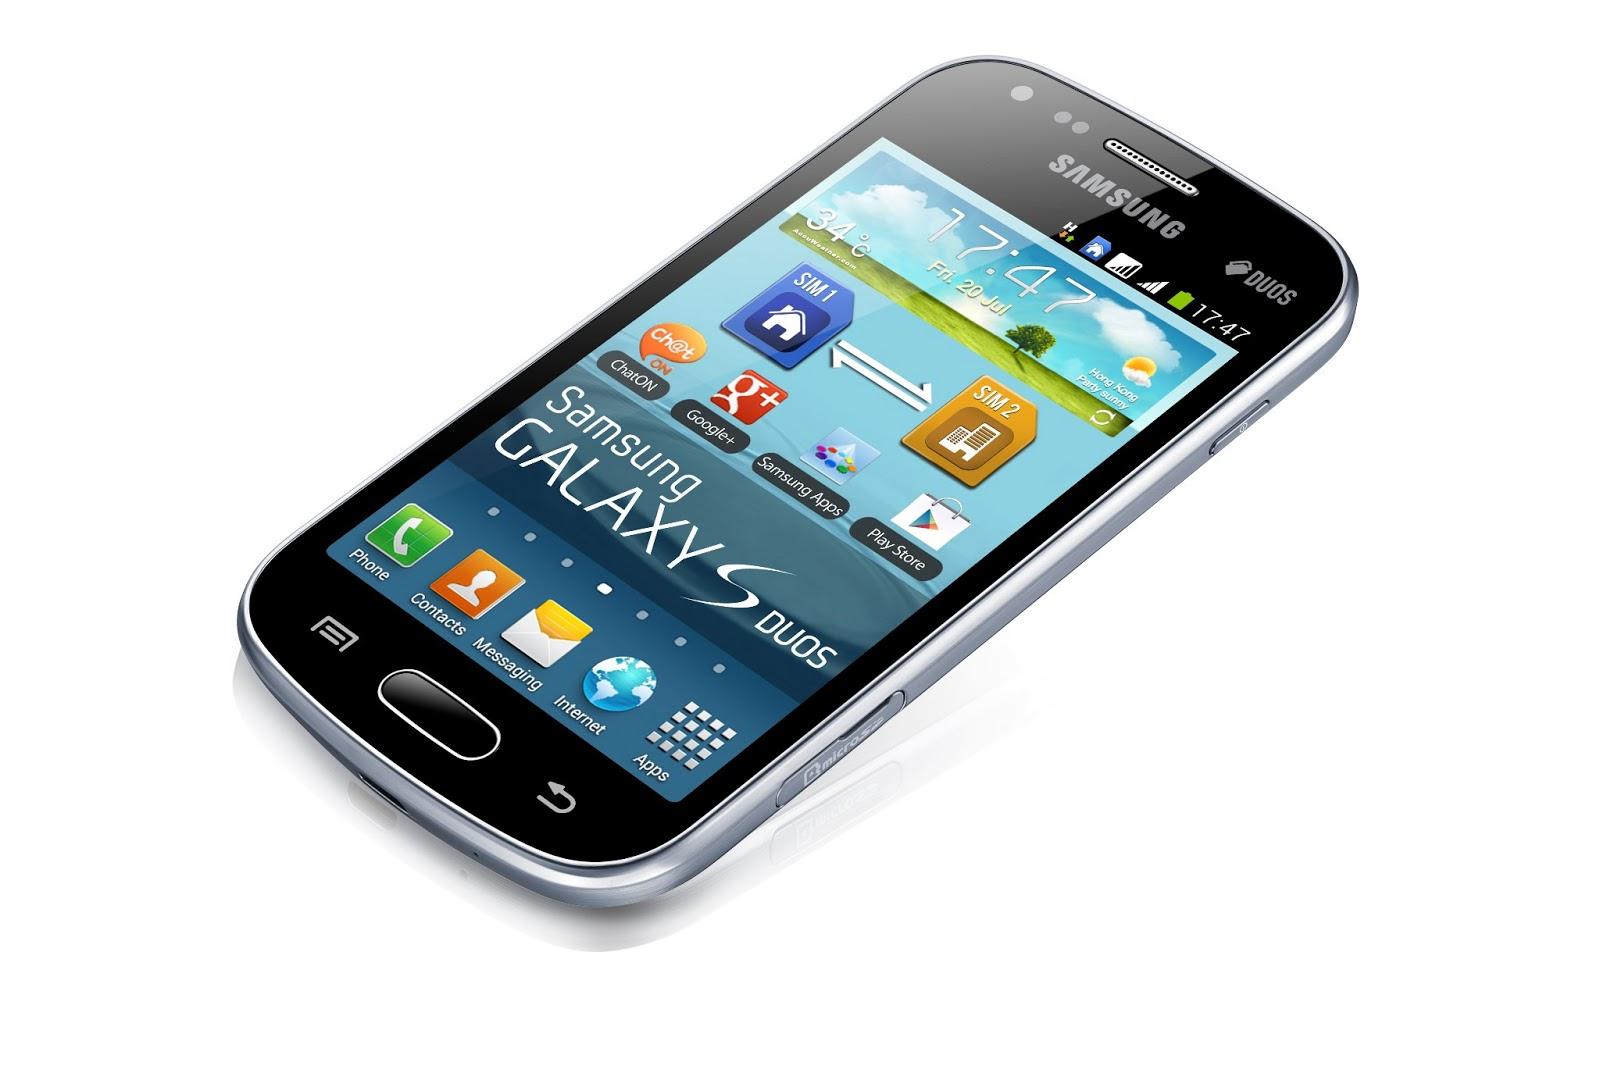 Samsung Mobile Phones Price List in India | 2019